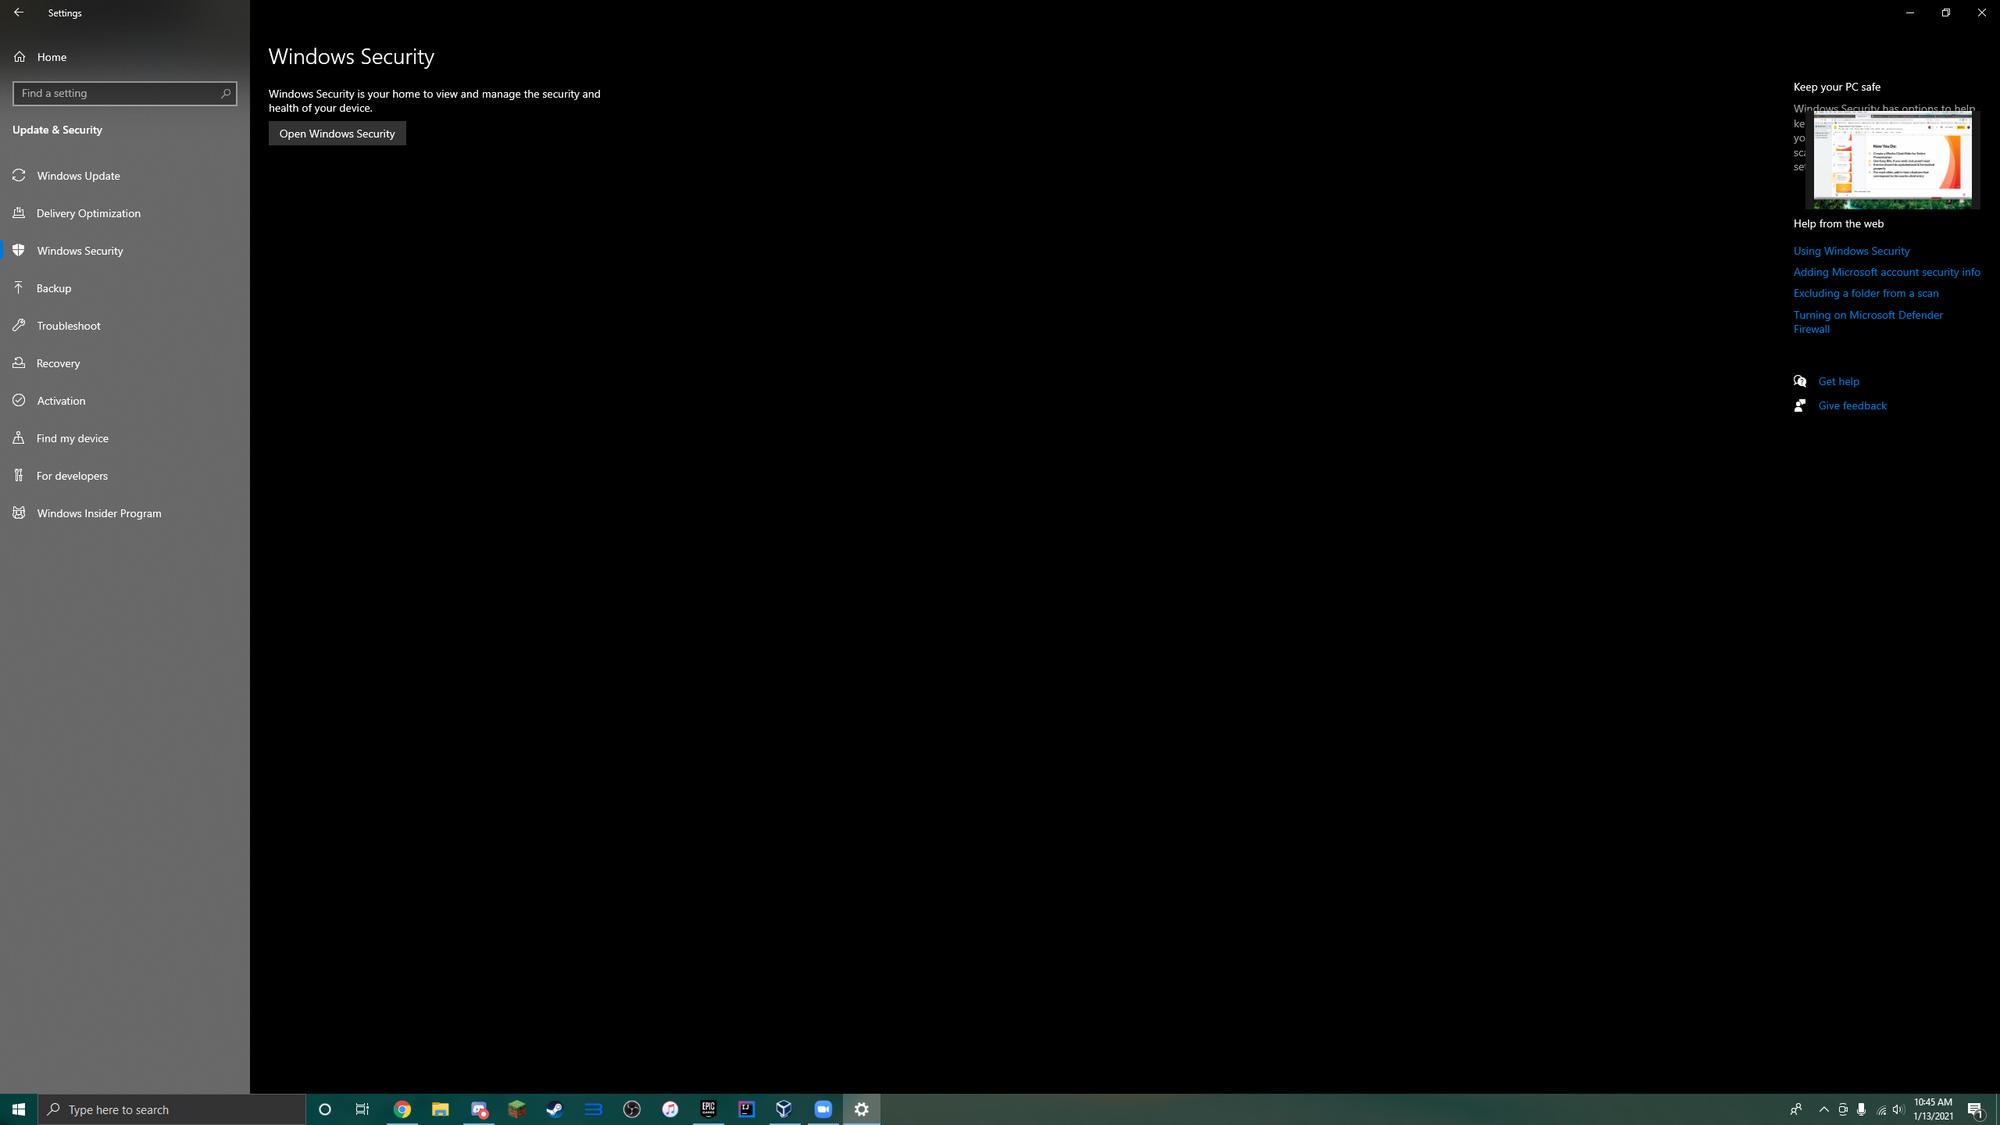 Windows 10 Security Features Missing fd9dbd39-185d-437d-ab1b-f51f1f7800c9?upload=true.png